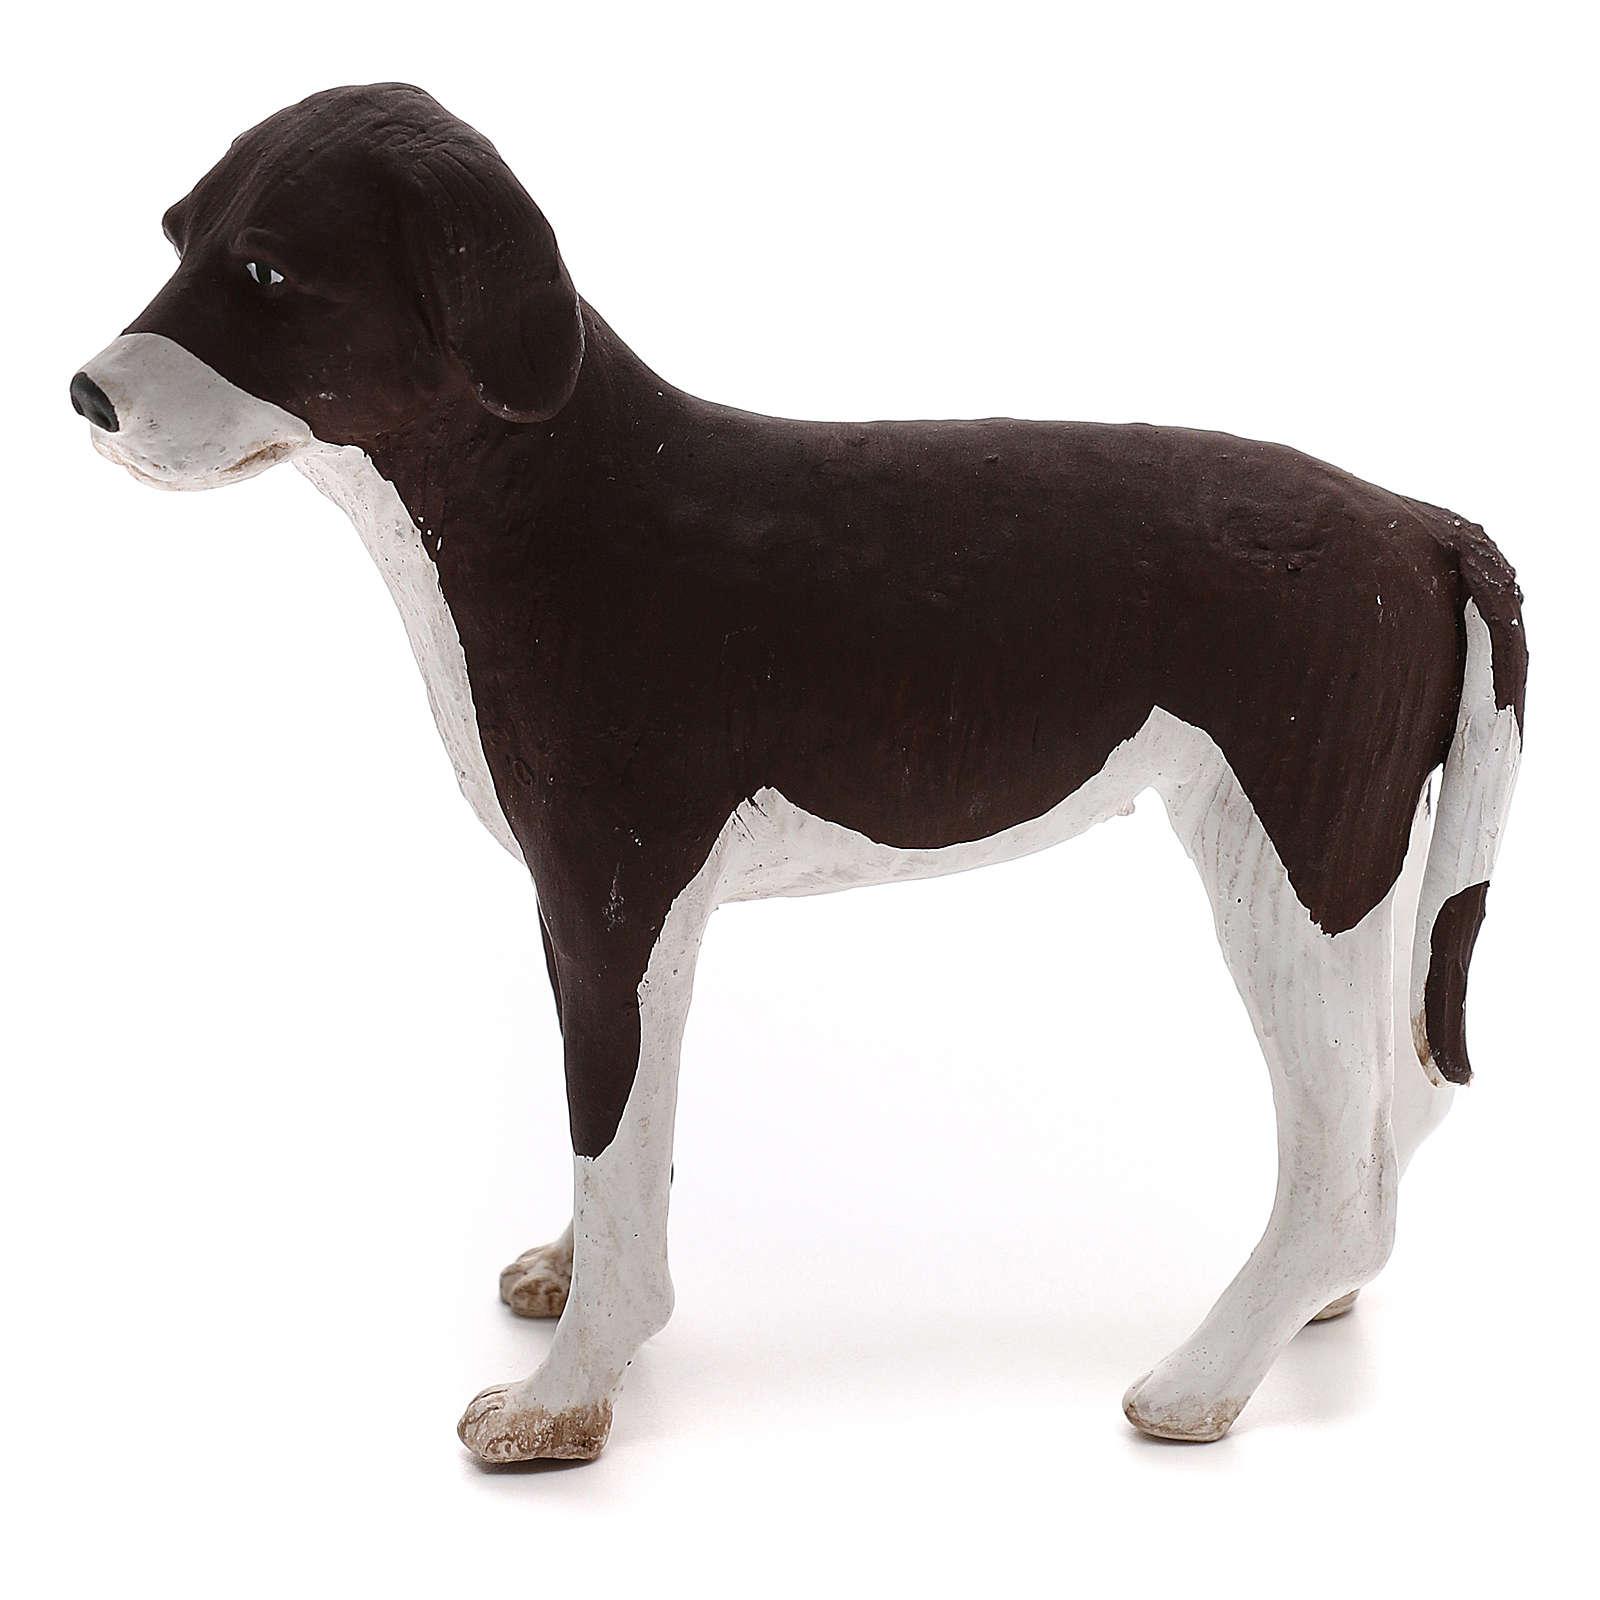 Perro de pie 24 cm de altura media terracota belén Nápoles 4